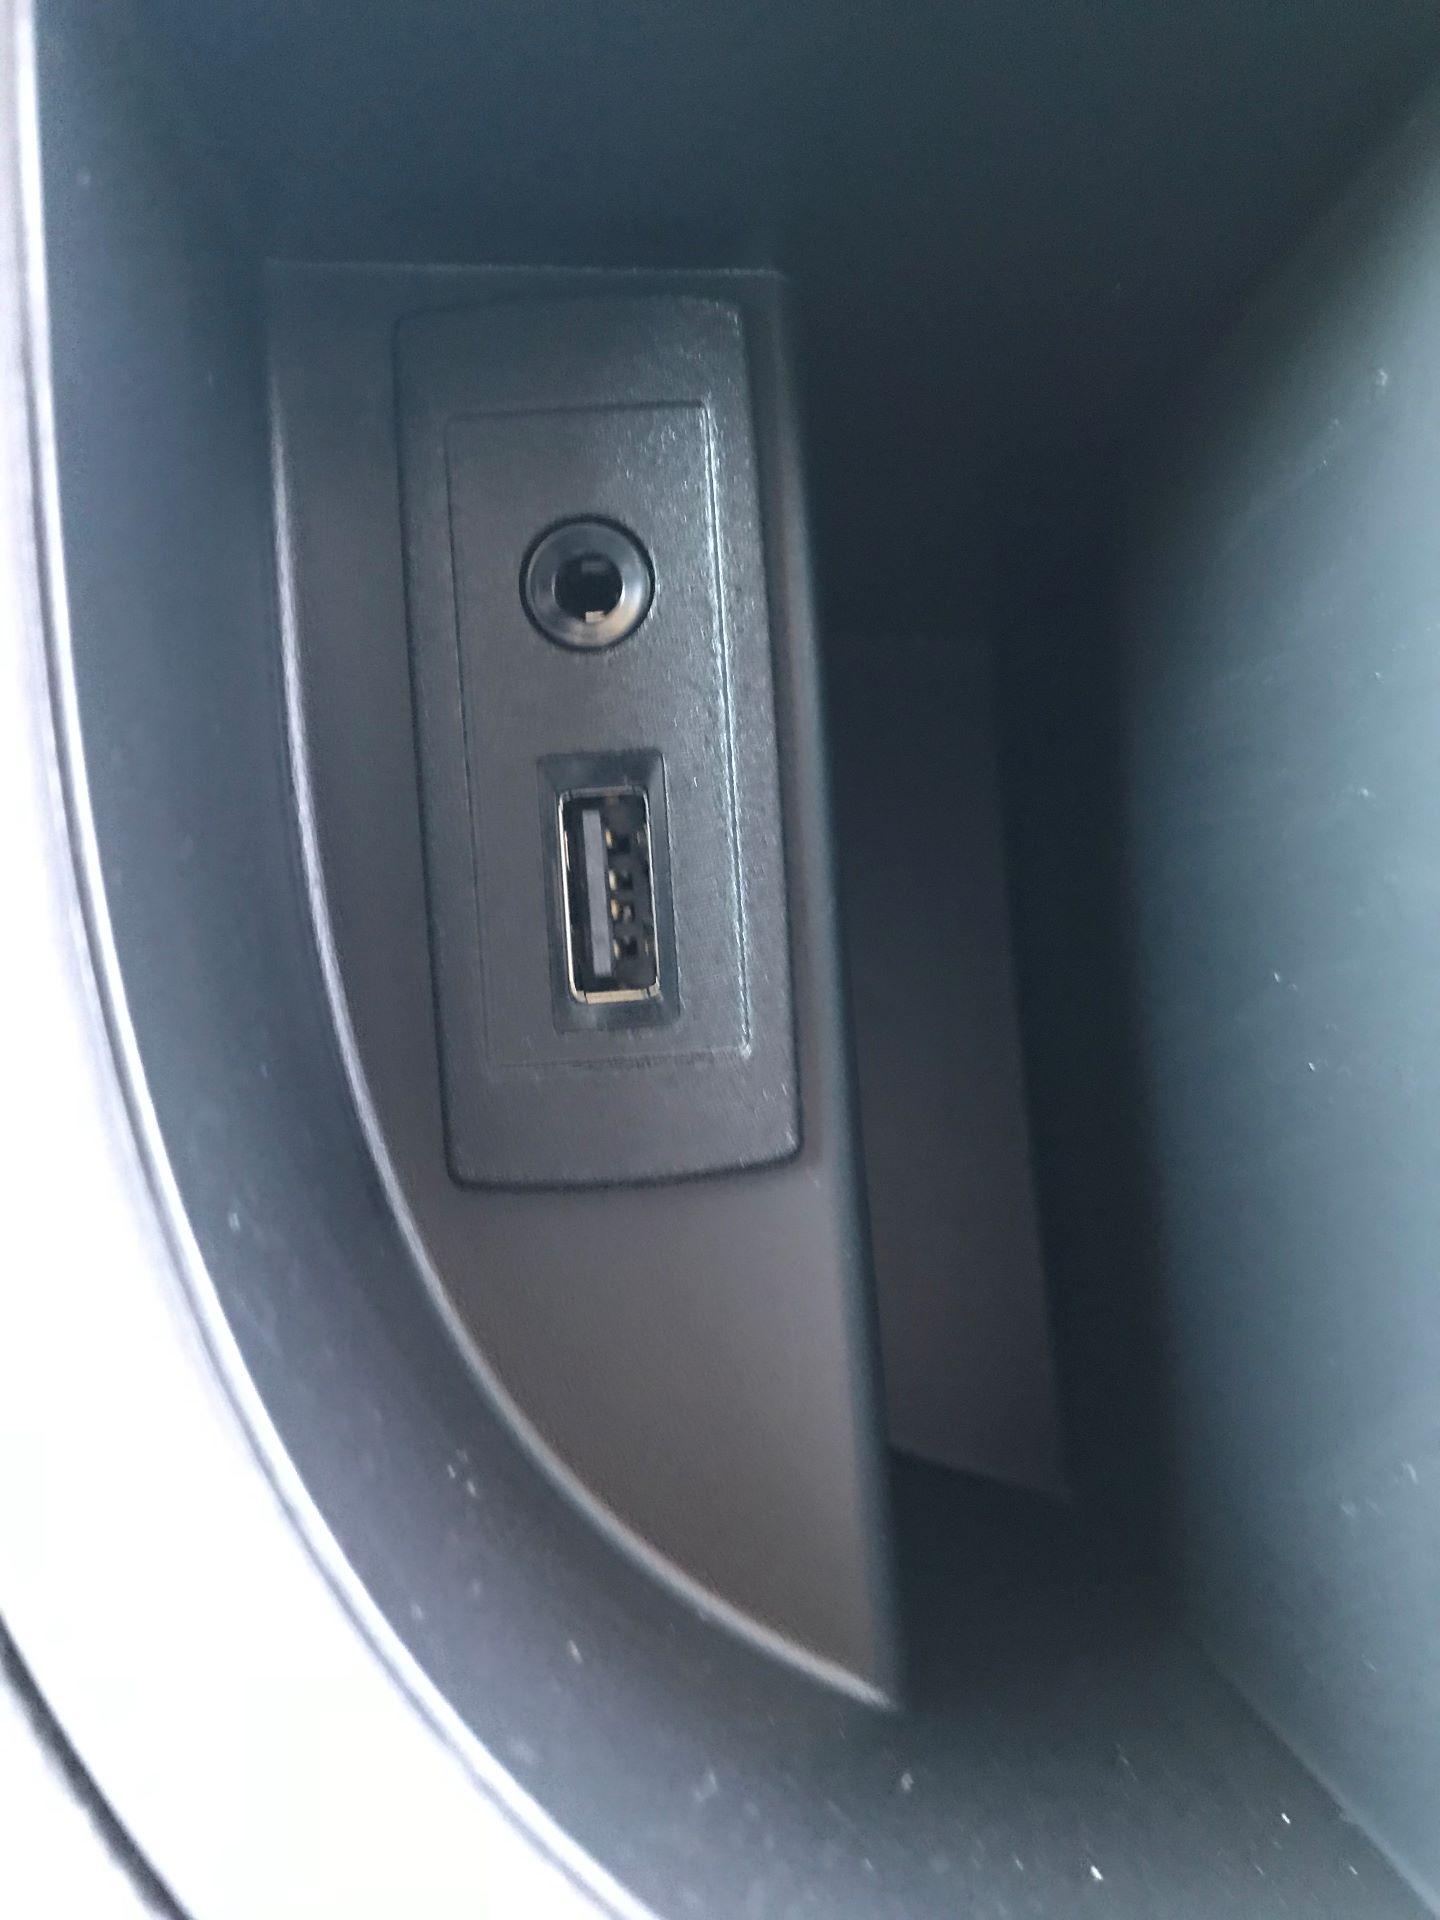 2019 Mercedes-Benz Vito 111CDI LWB 110PS EURO 6, AIR CON (YN19ZGH) Image 20